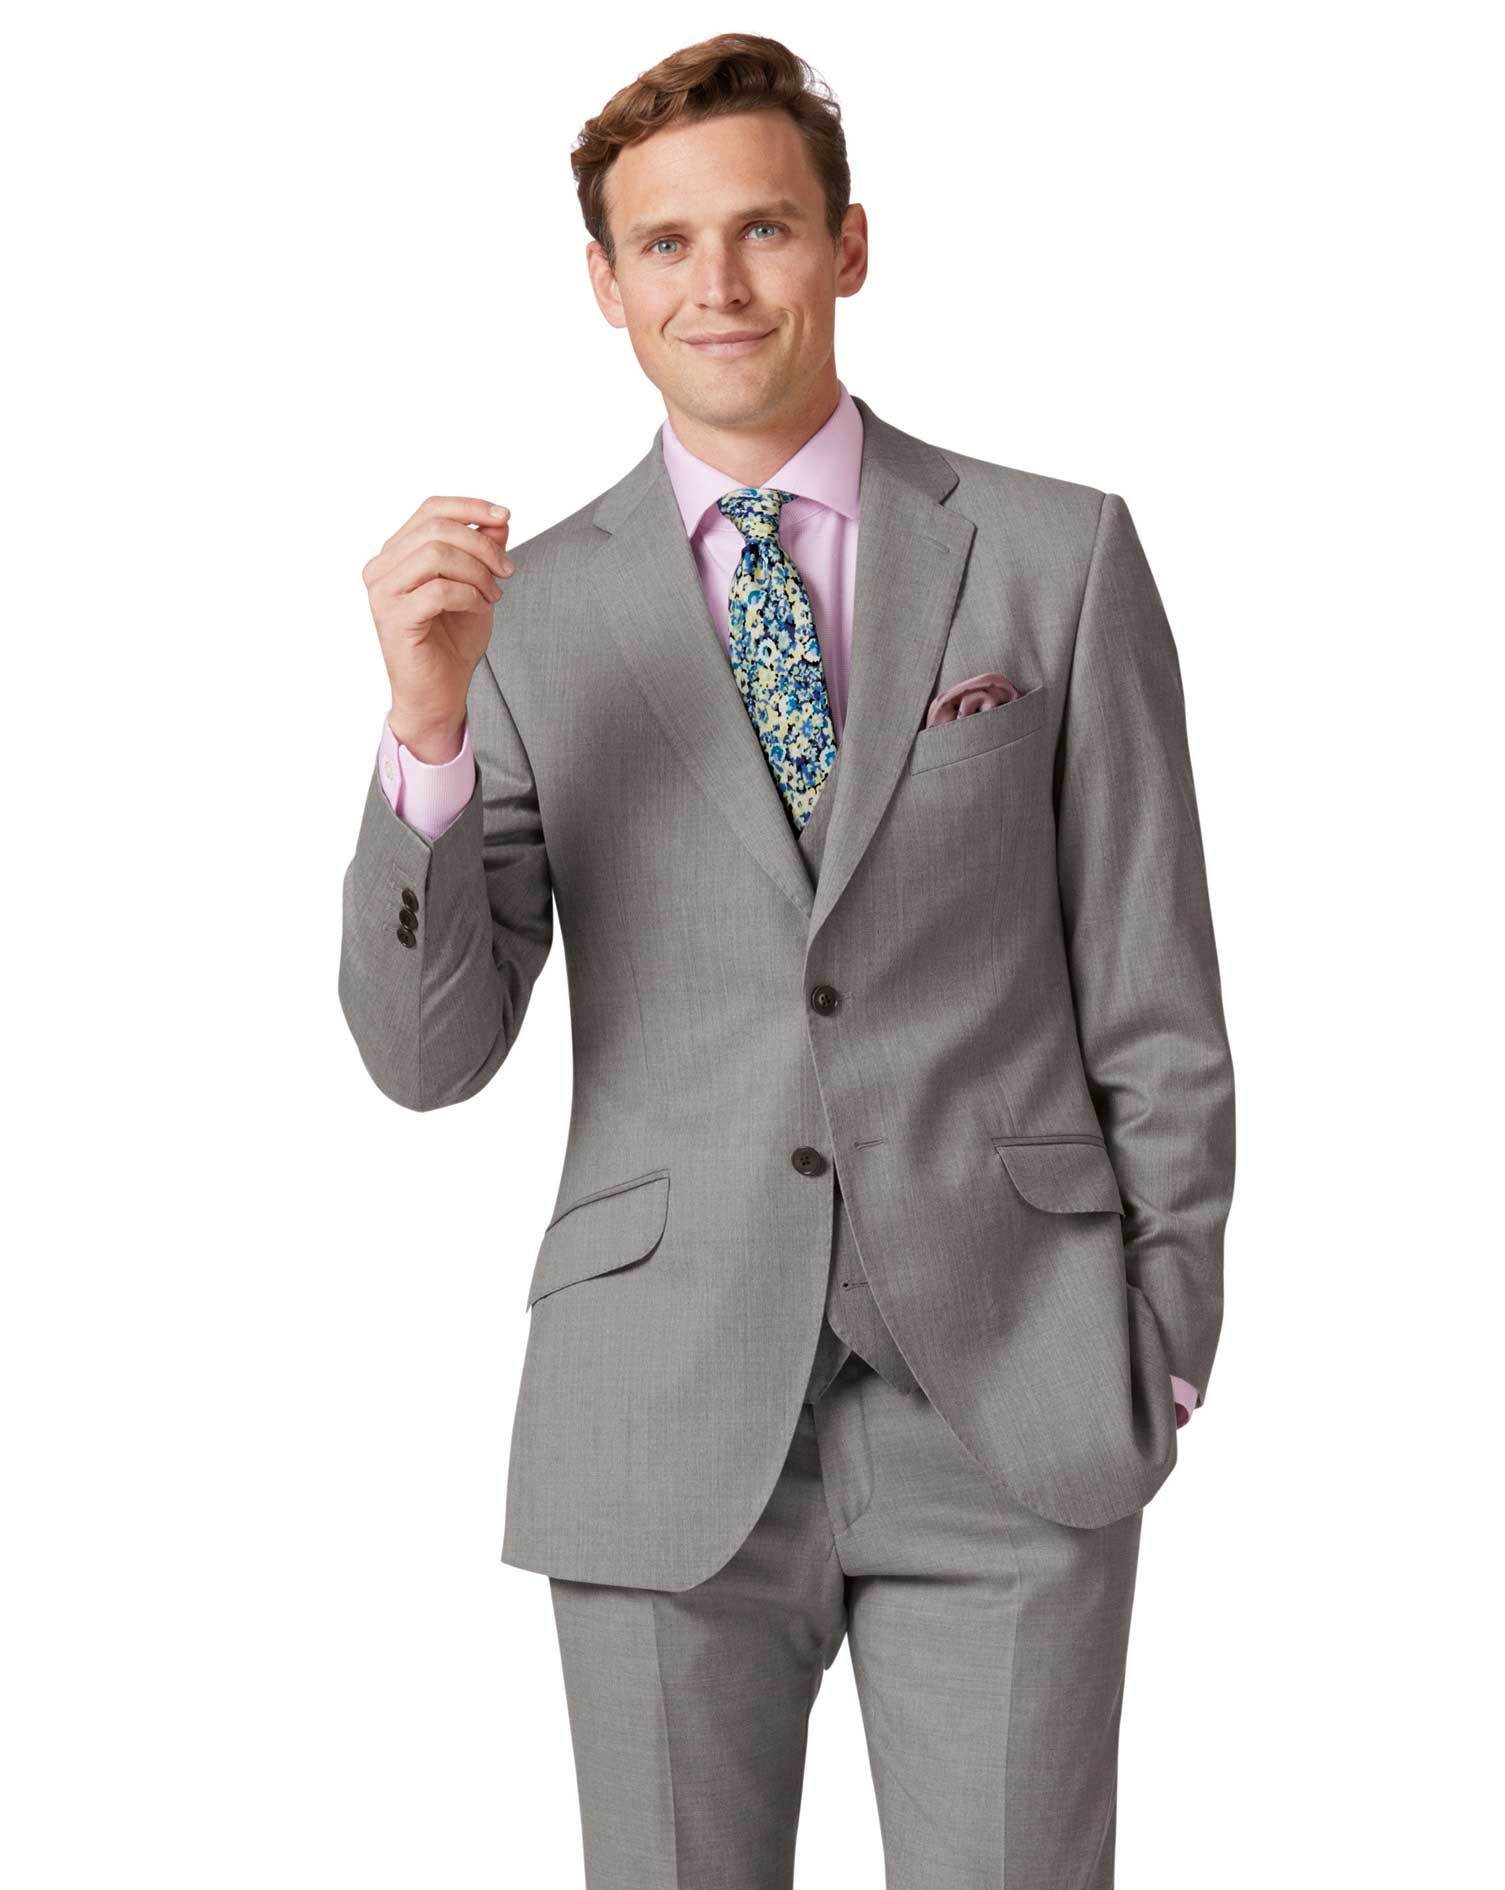 Silver Slim Fit Italian Suit Wool Jacket Size 36 Regular by Charles Tyrwhitt